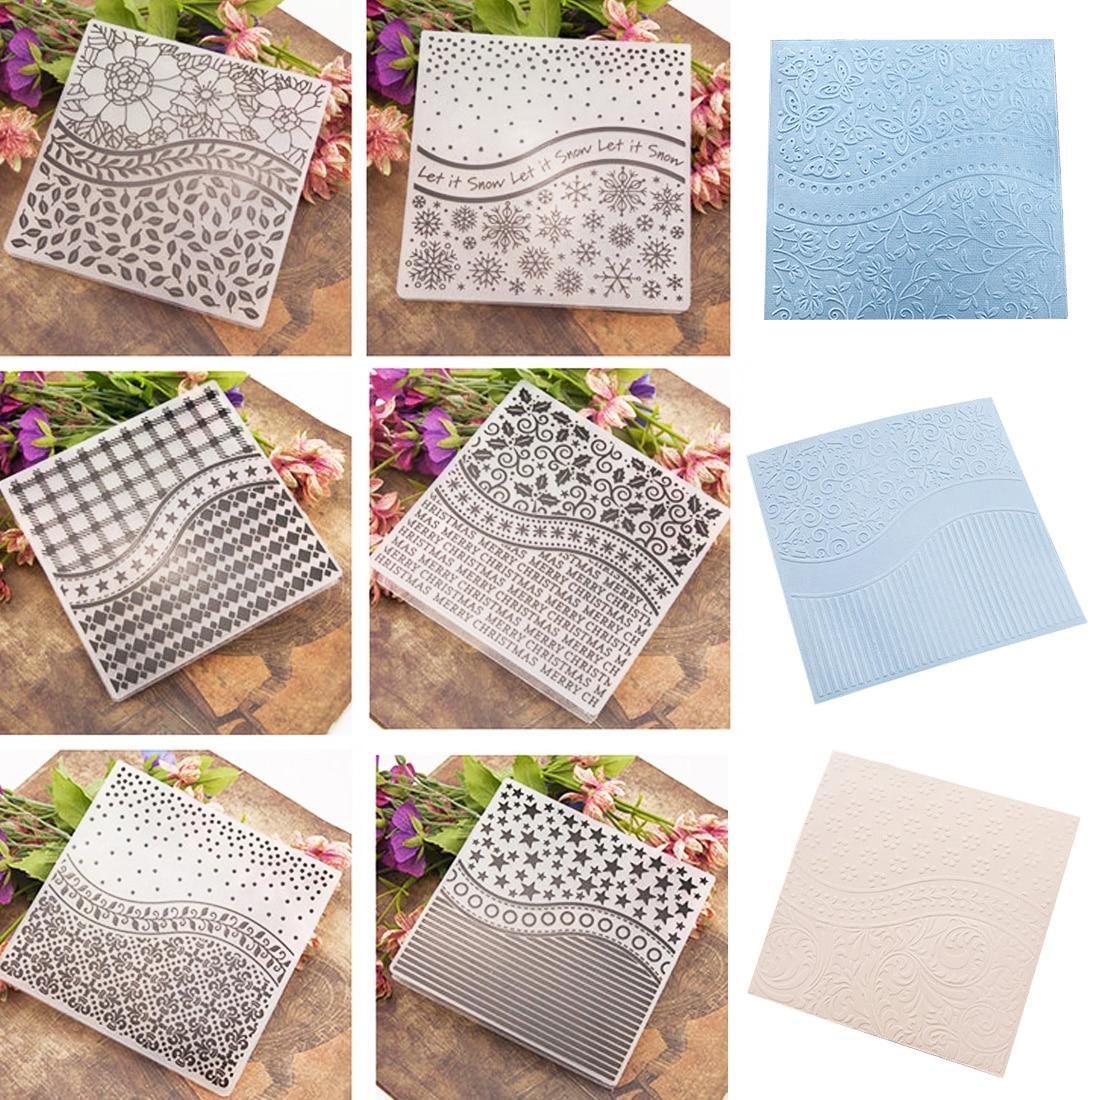 Plastic DIY Embossing Folder Stencils Template Molds Scrapbooking Paper Crafts